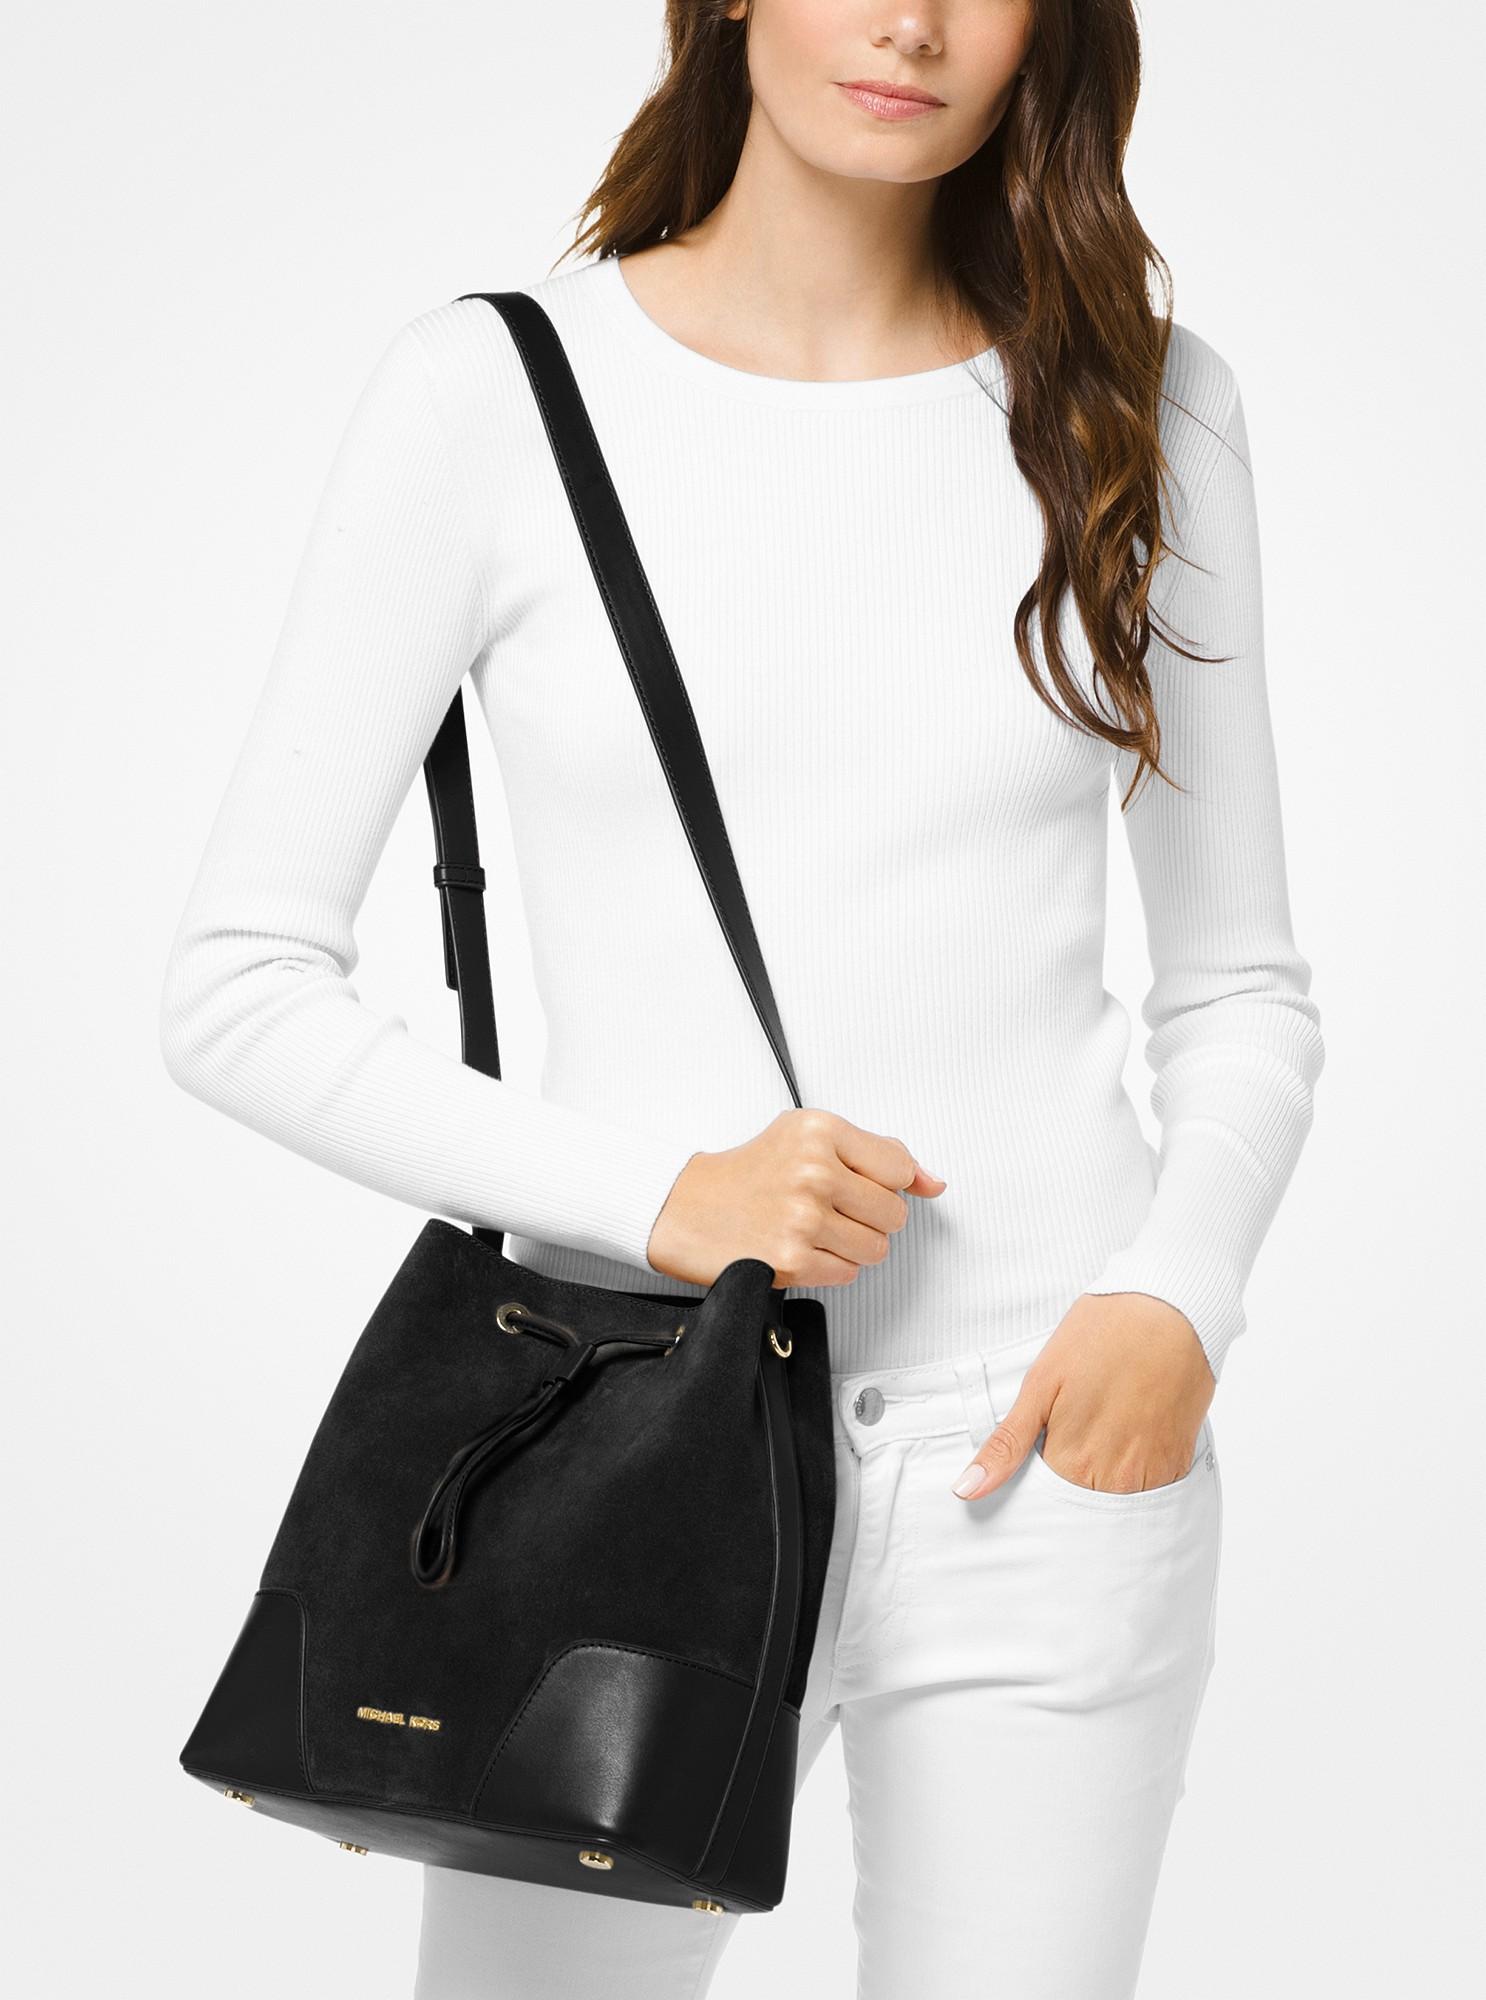 5b59b67d8887 Michael Kors Cary Medium Suede And Leather Bucket Bag - Maroon Oxbld